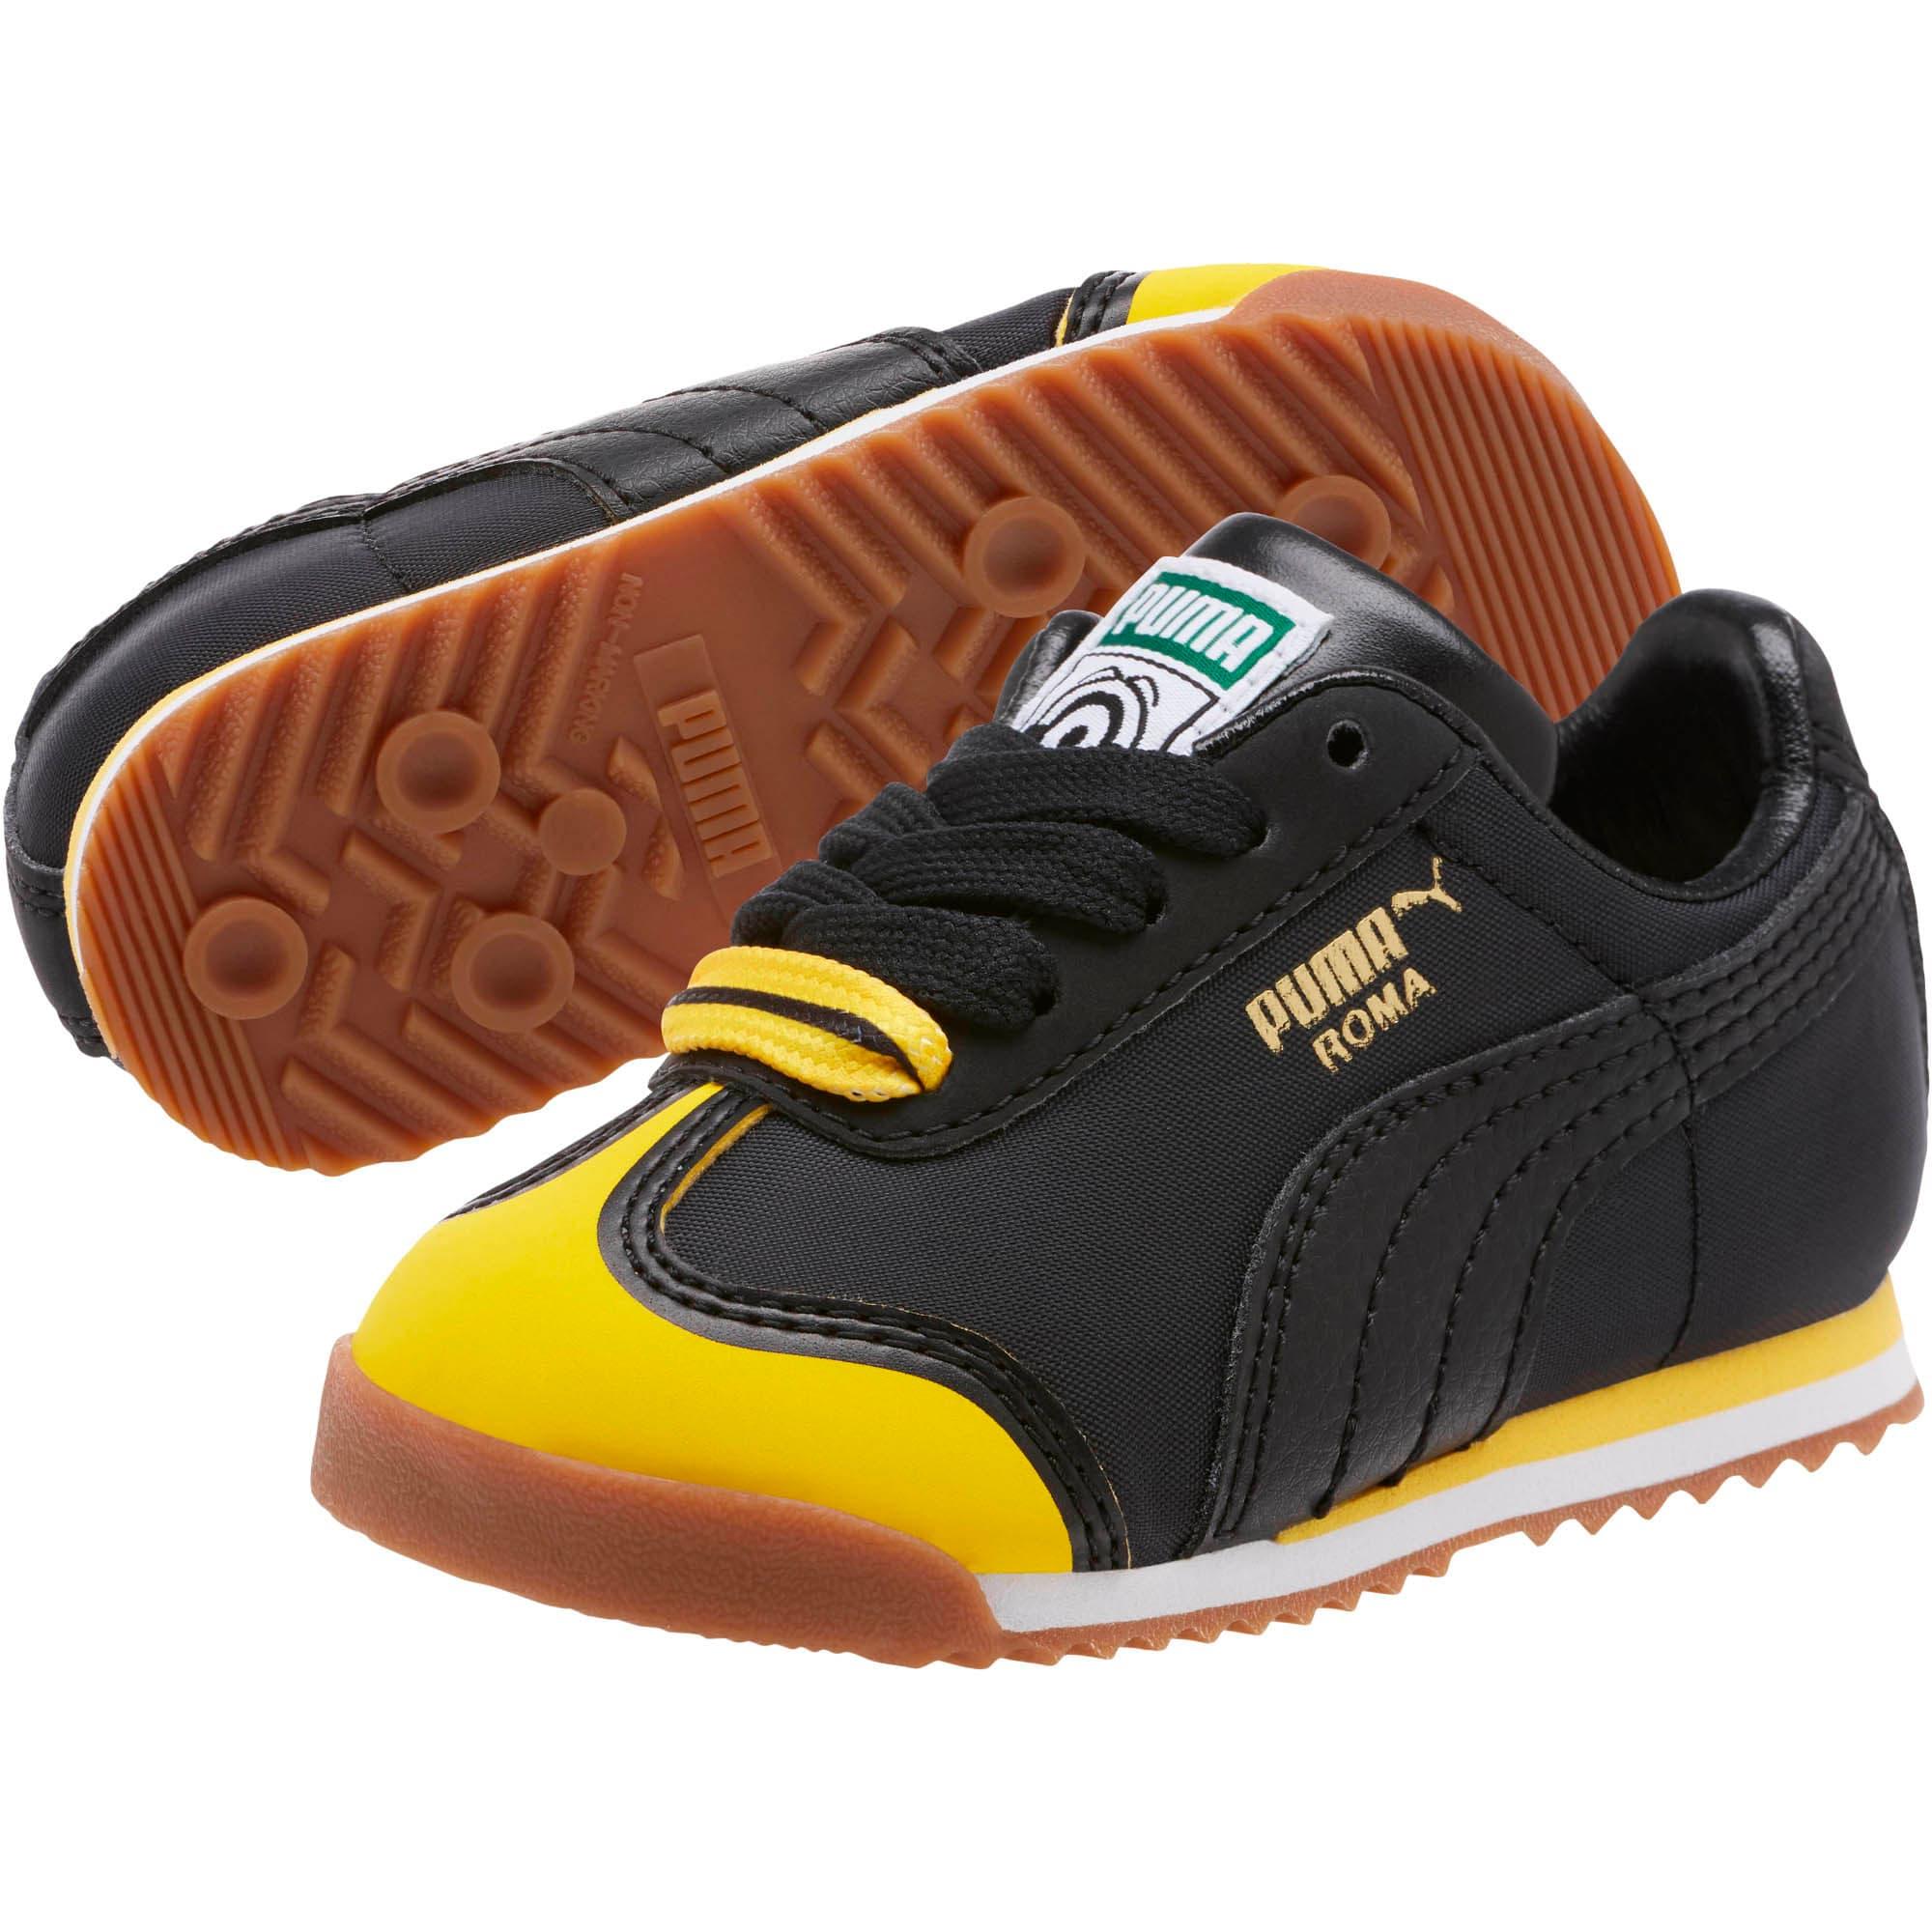 Thumbnail 2 of Minions Roma Toddler Shoes, Black-Minion Yellow-Black, medium